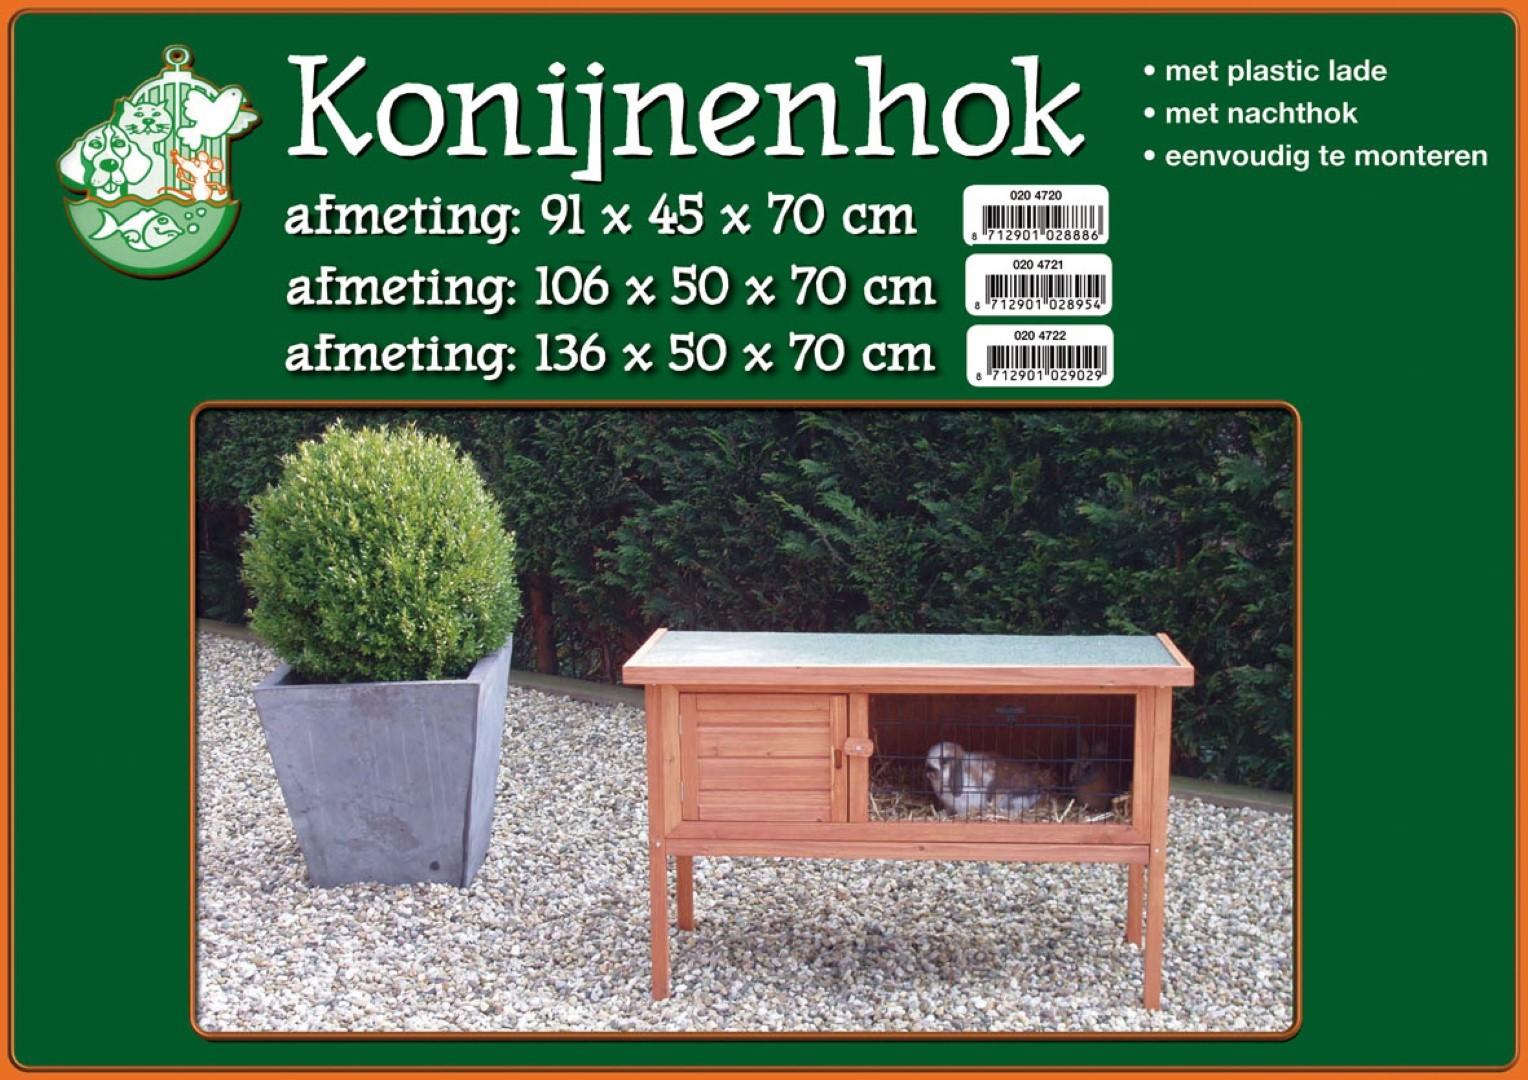 Konijnenhok bouwpakket met plastic lade bruin 91 cm